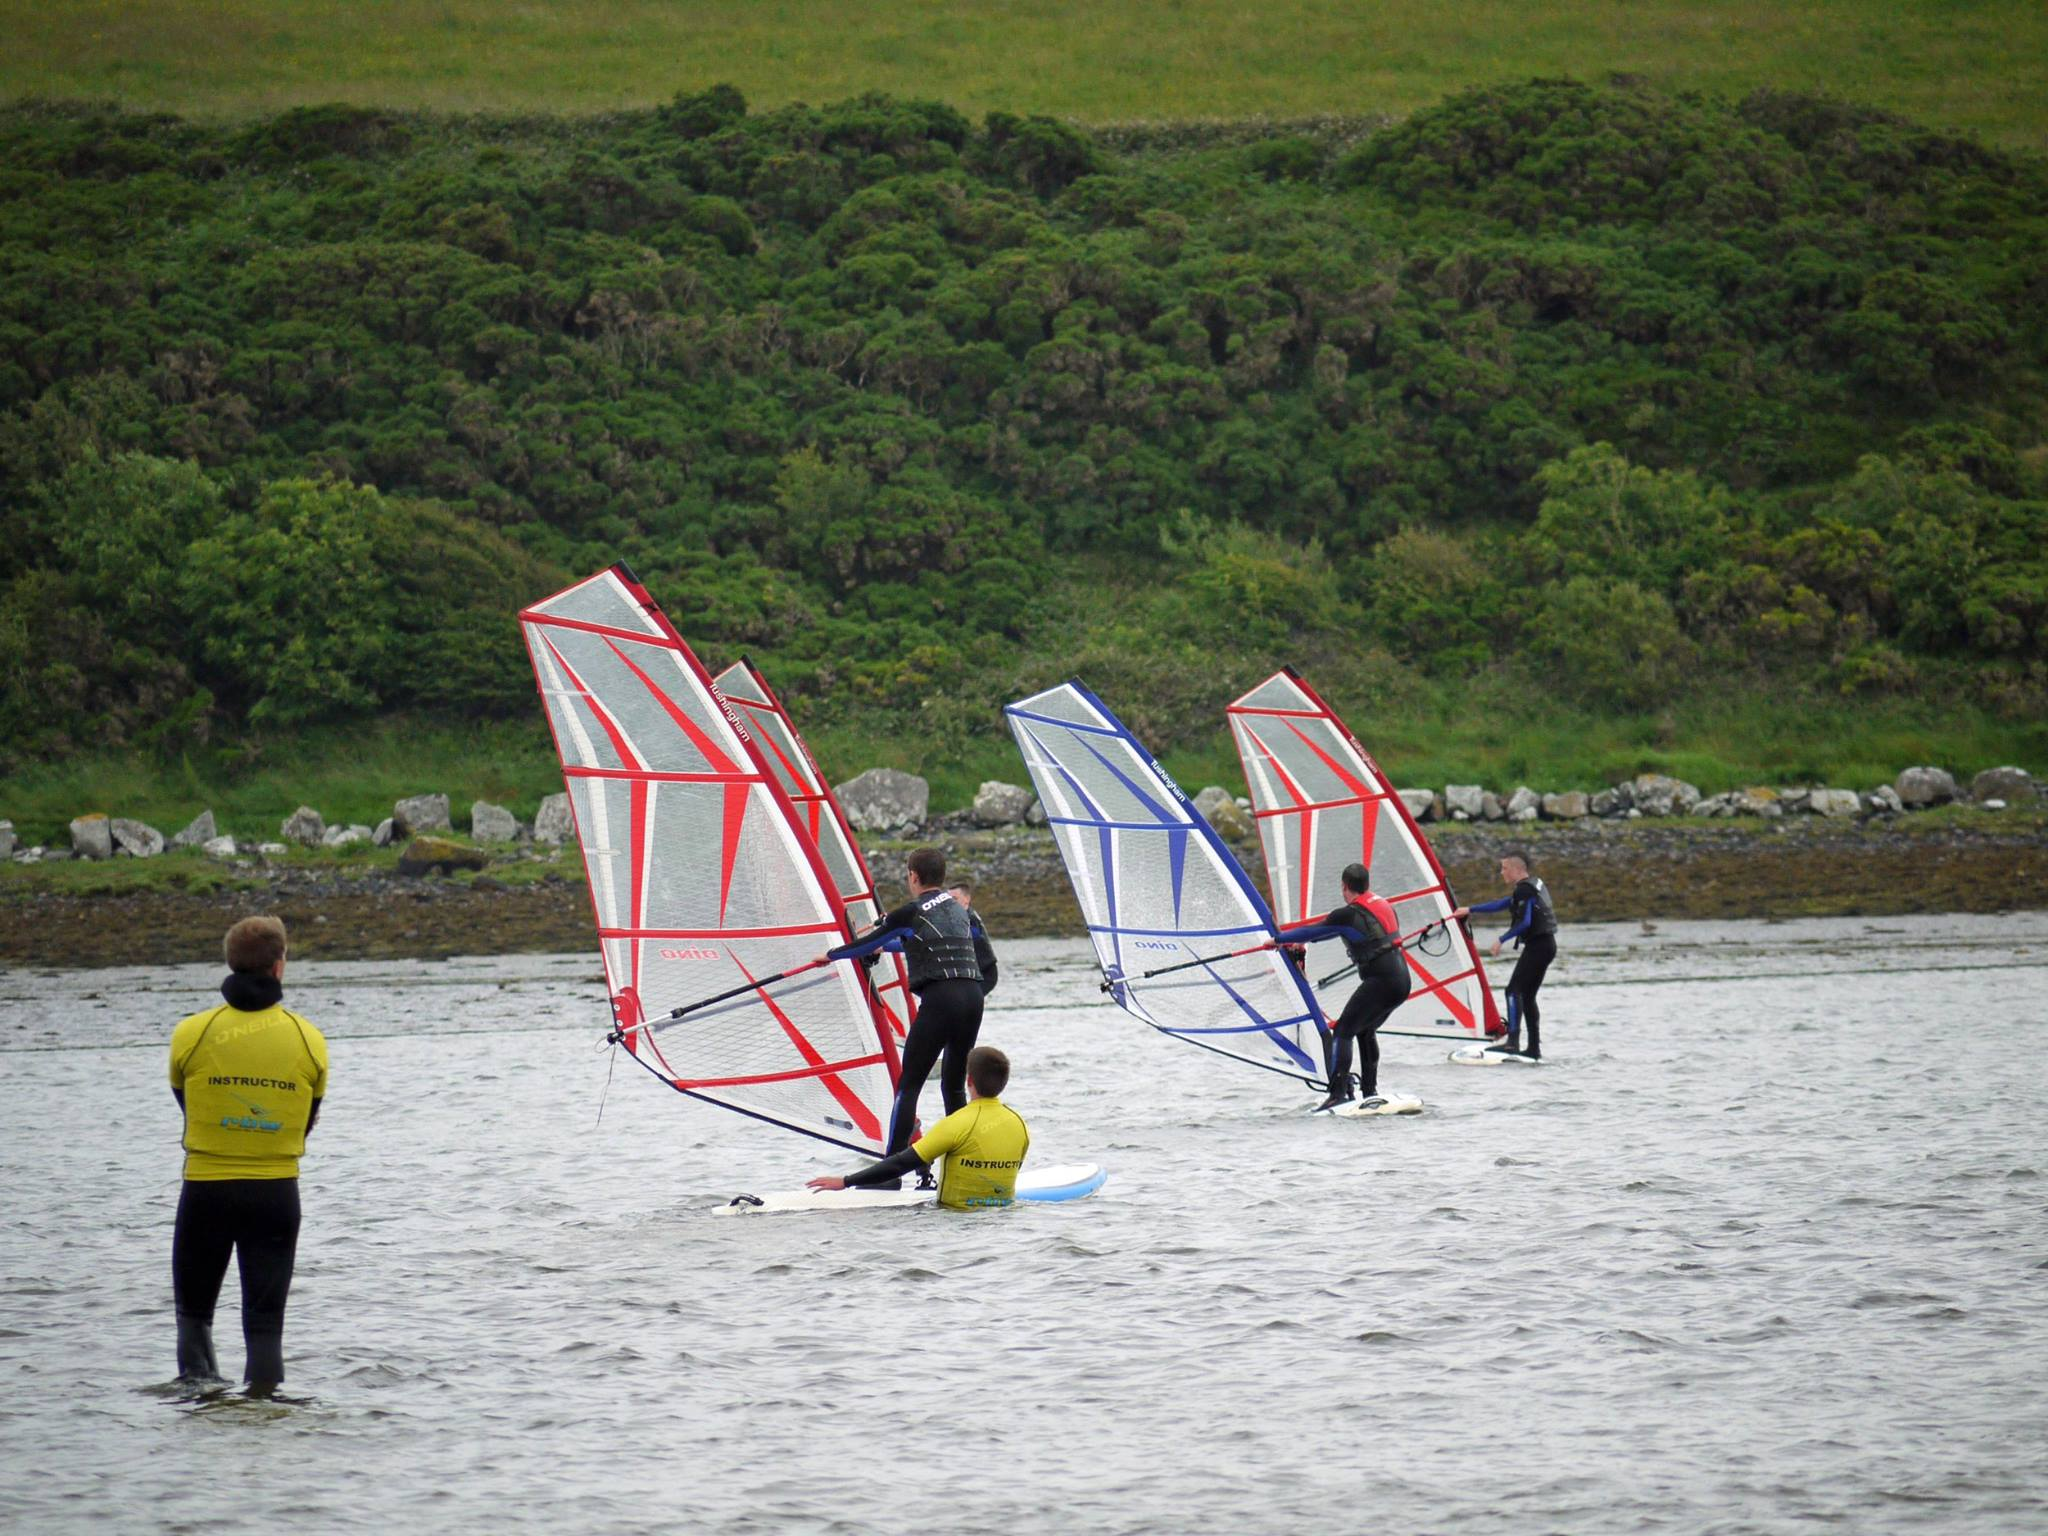 Rusheen Bay Windsurfing Centre Galway - Visit Galway